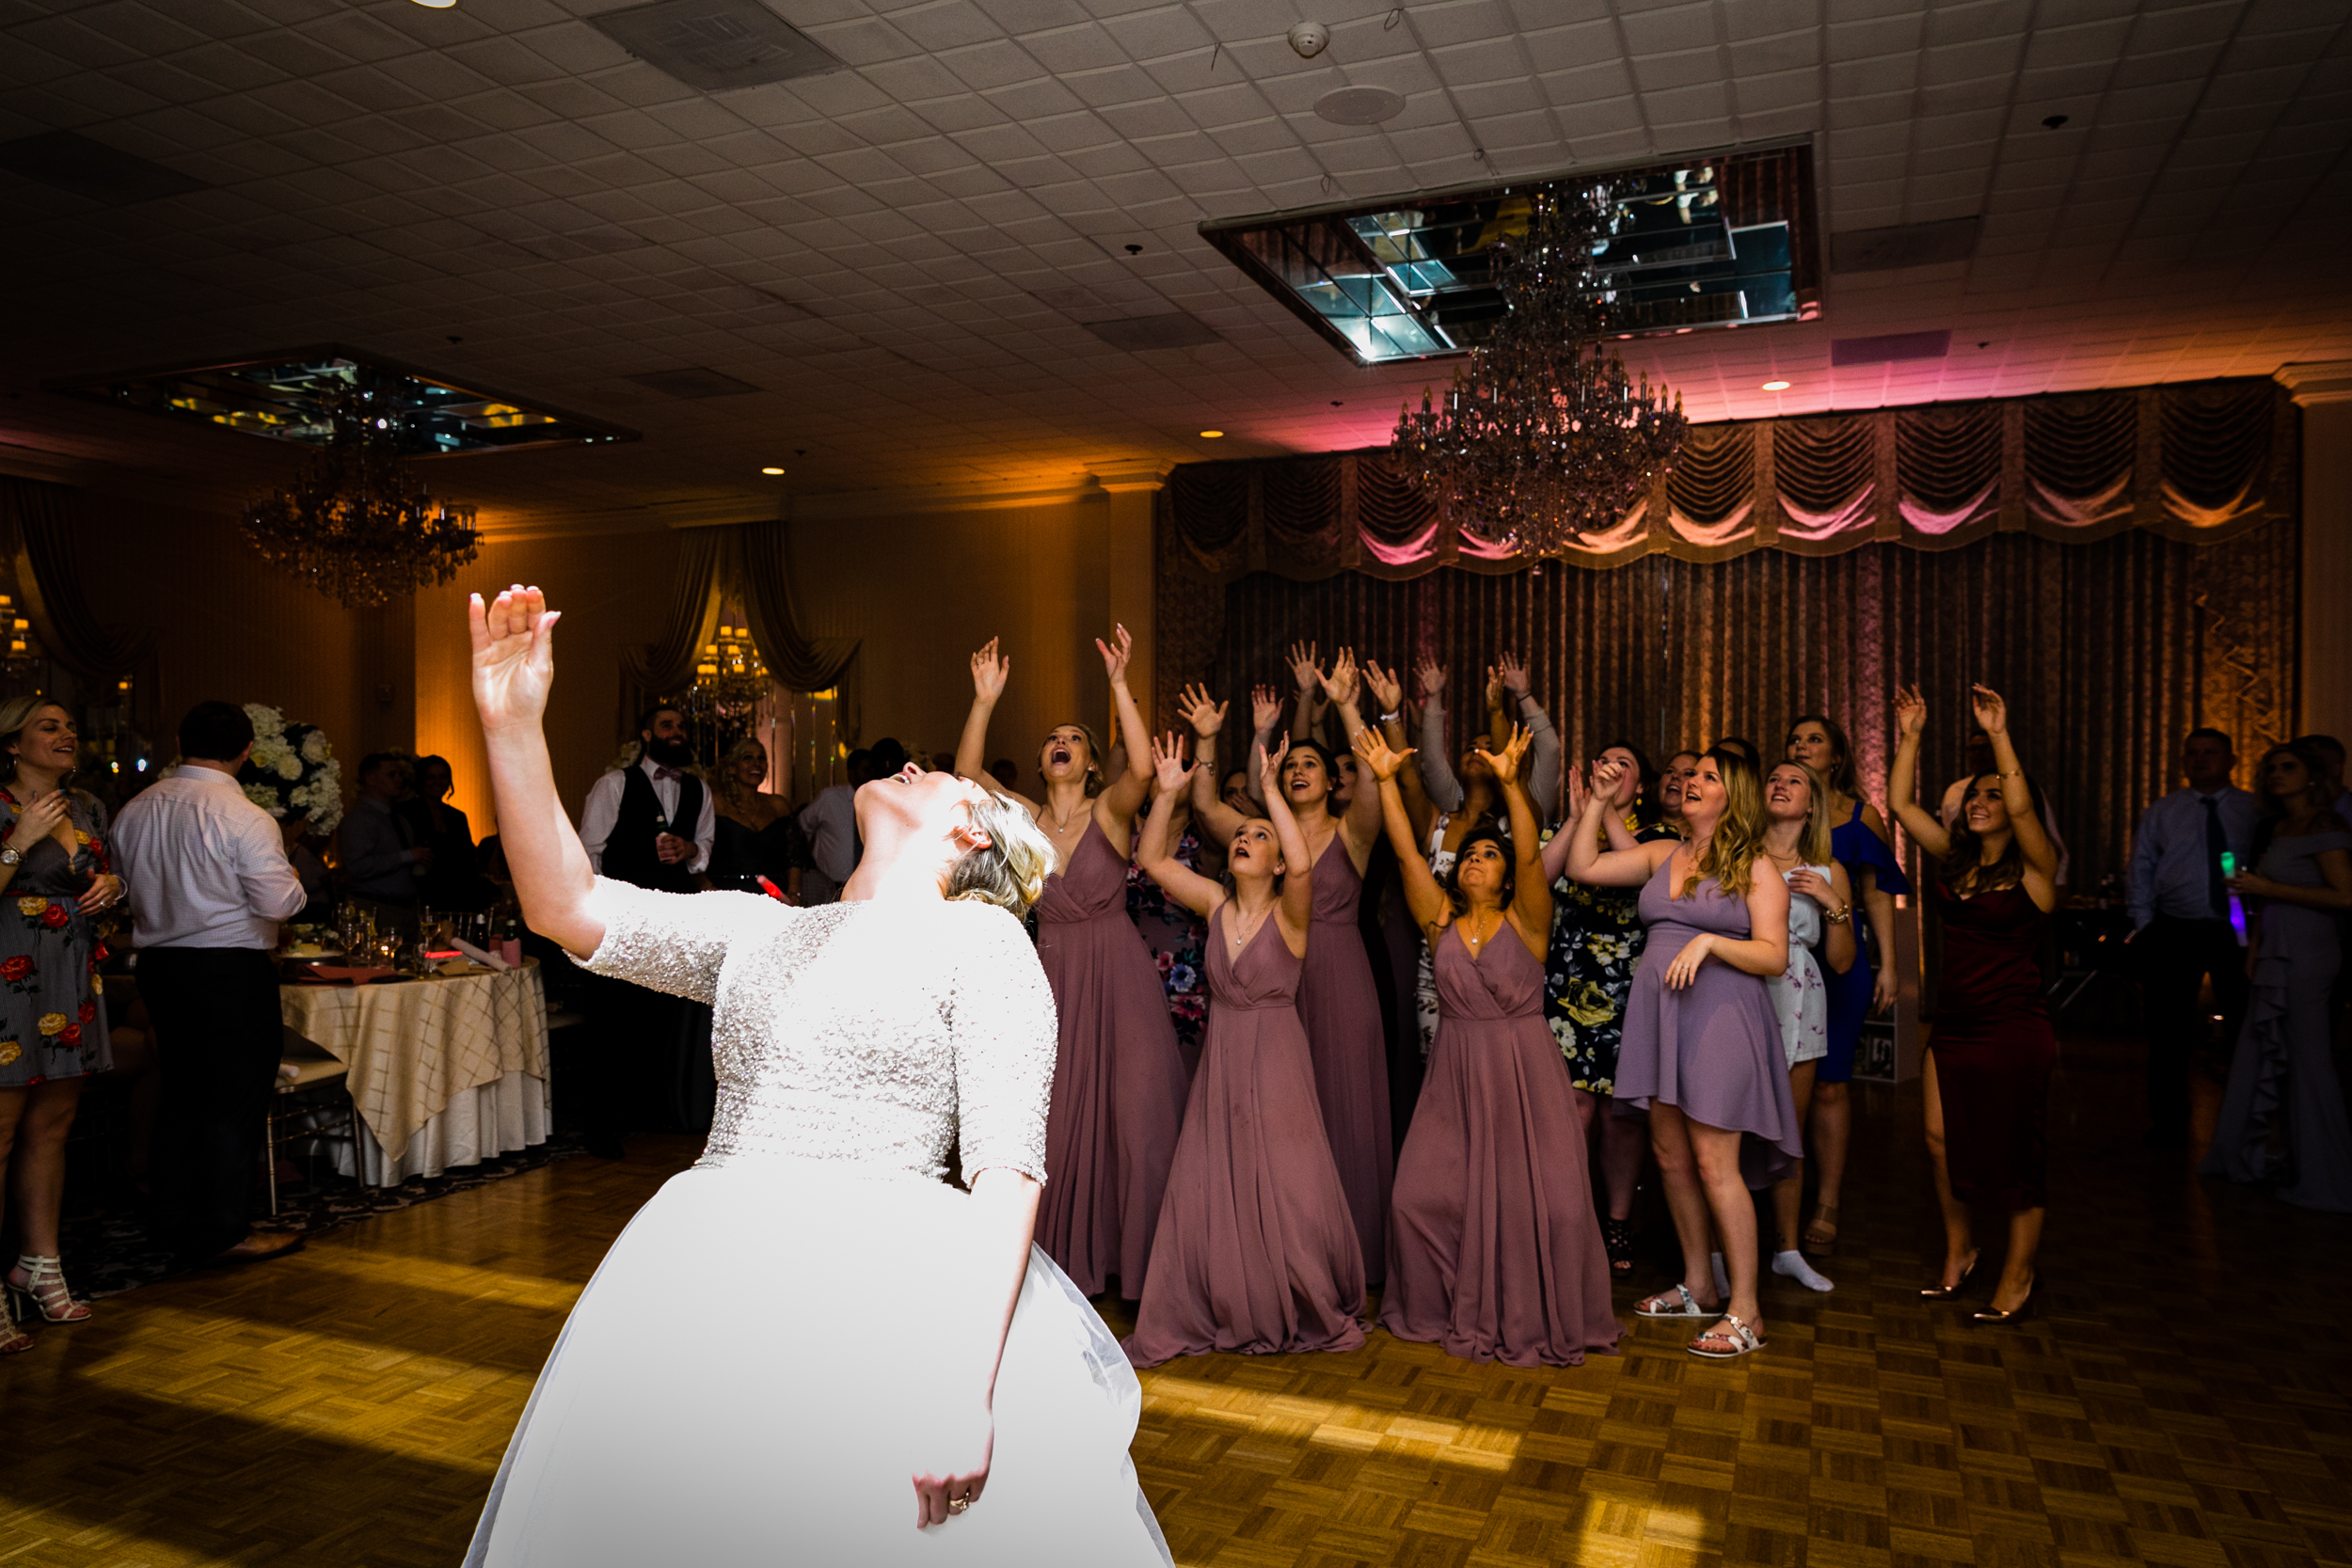 CELEBRATIONS BENSALEM WEDDING PHOTOGRAPHY-111.jpg